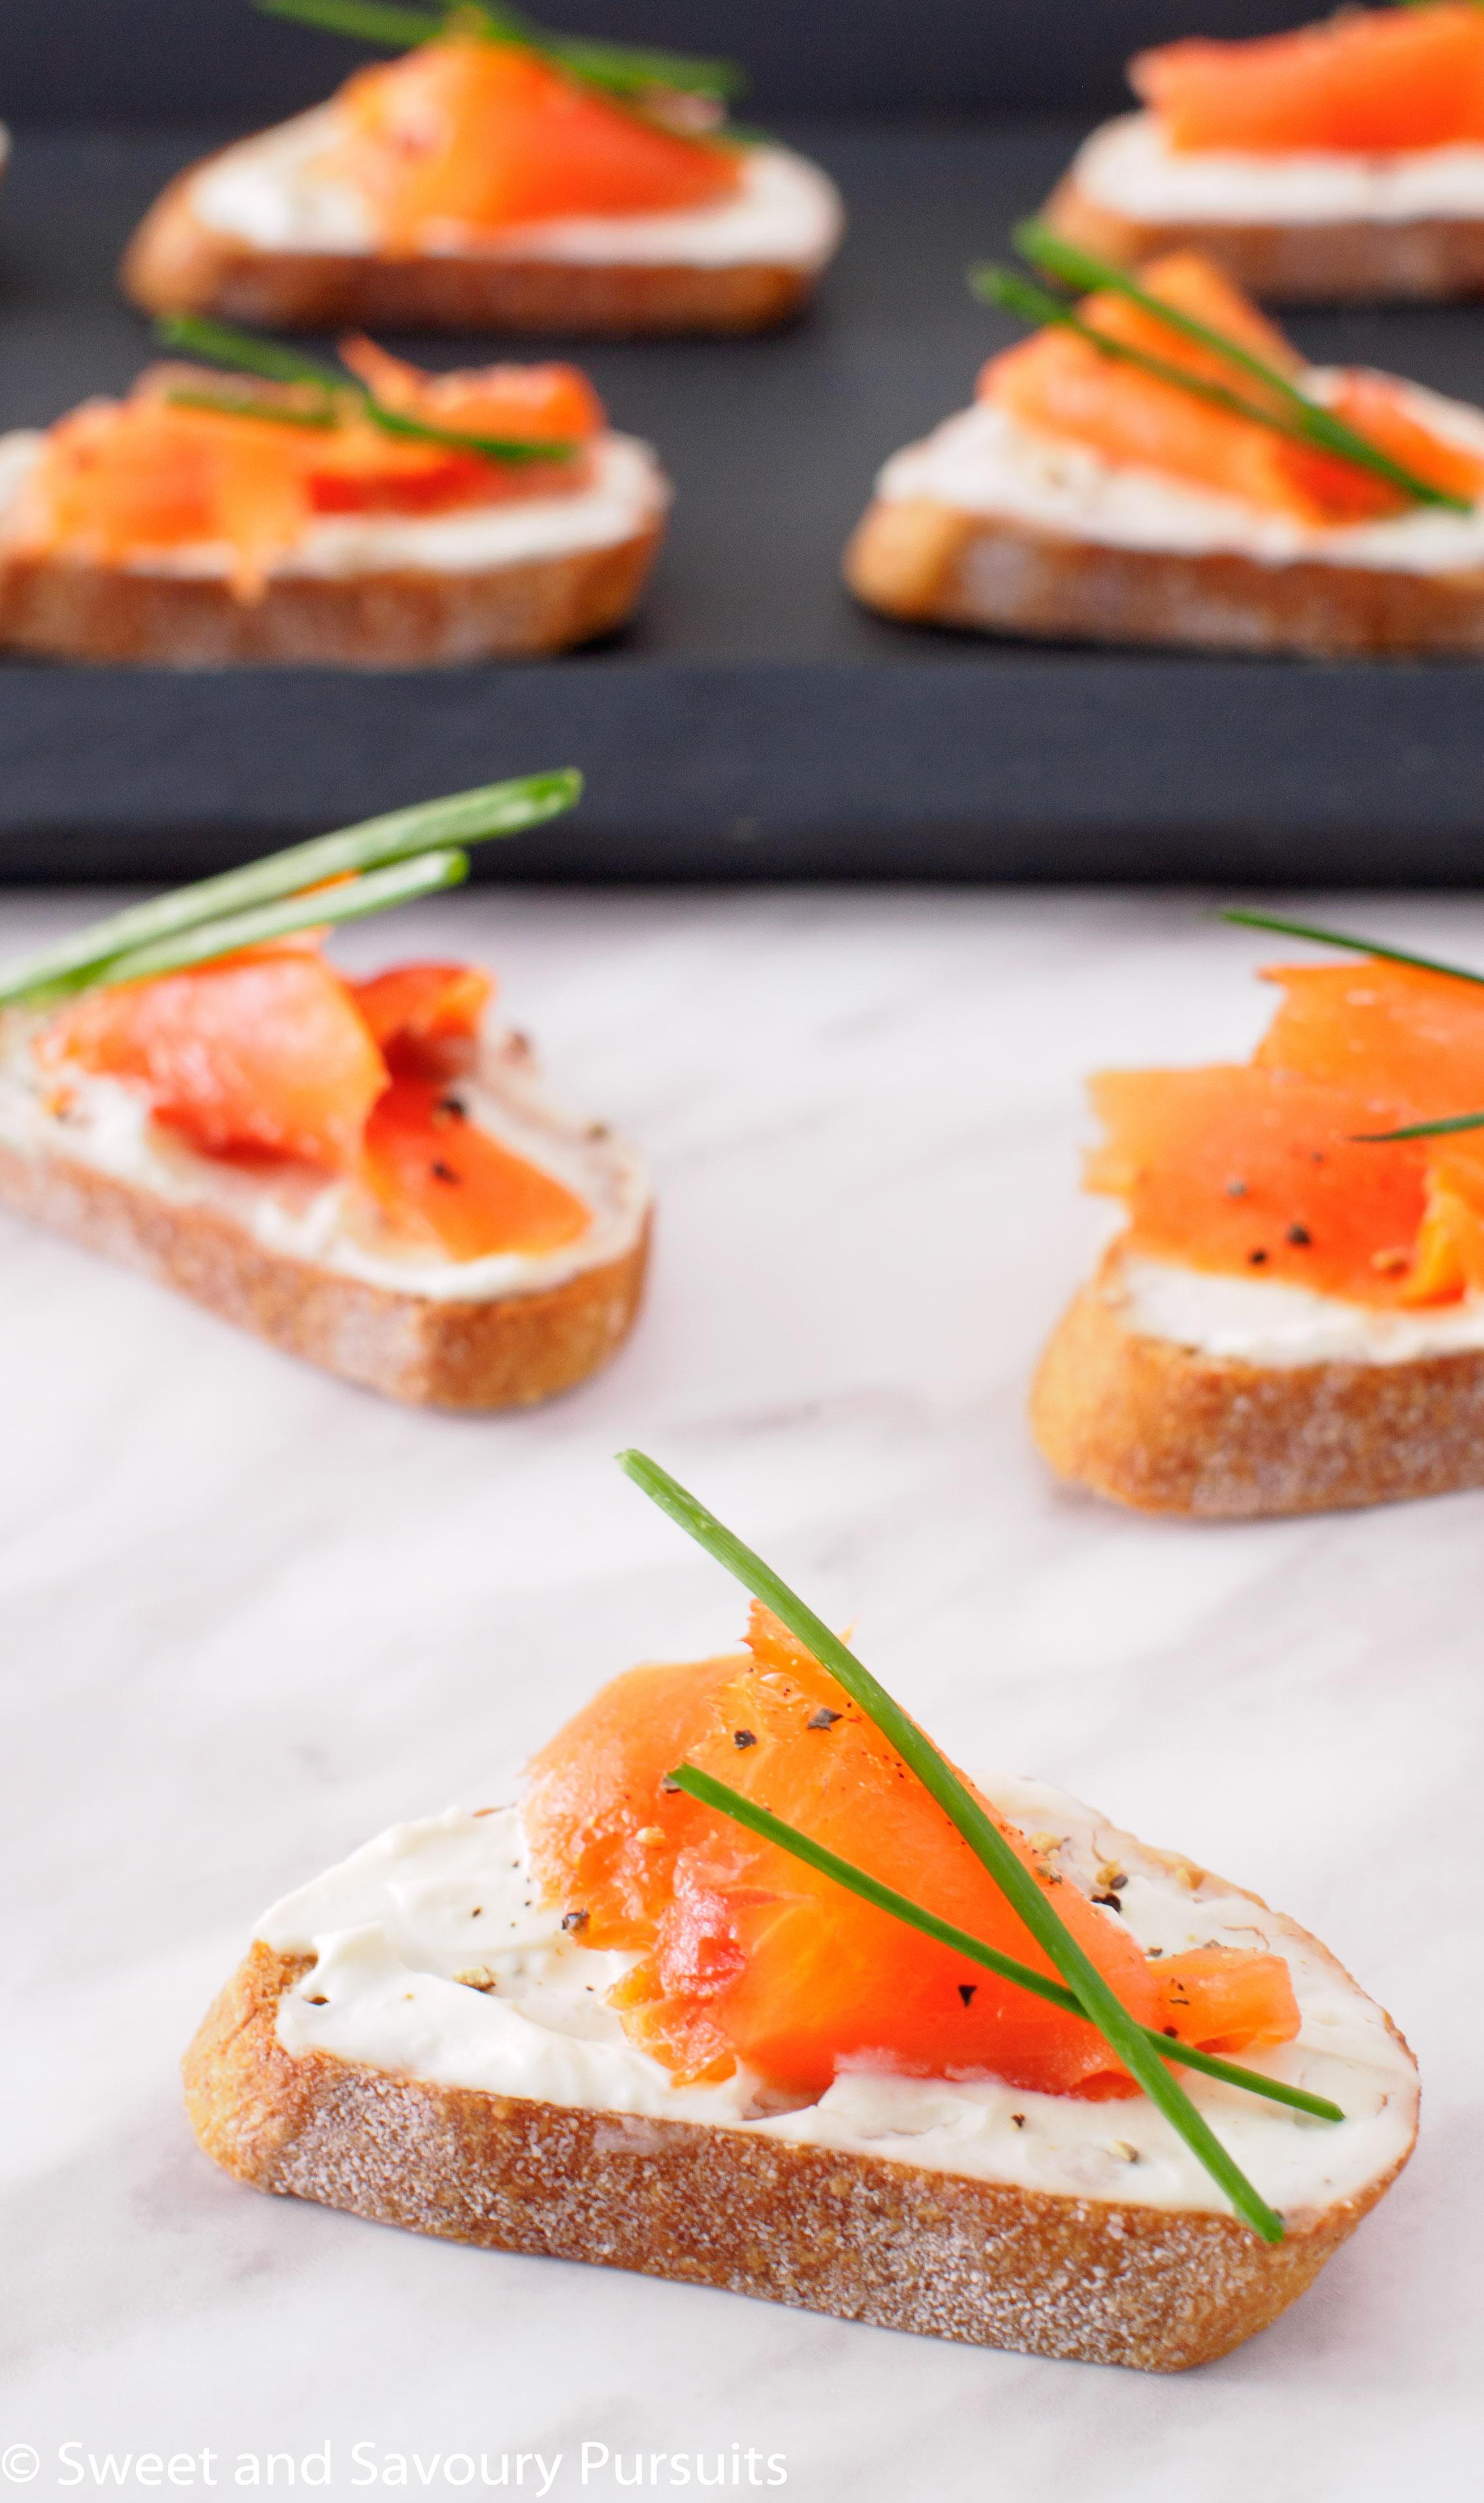 Smoked Salmon and Boursin Crostini - Sweet and Savoury Pursuits